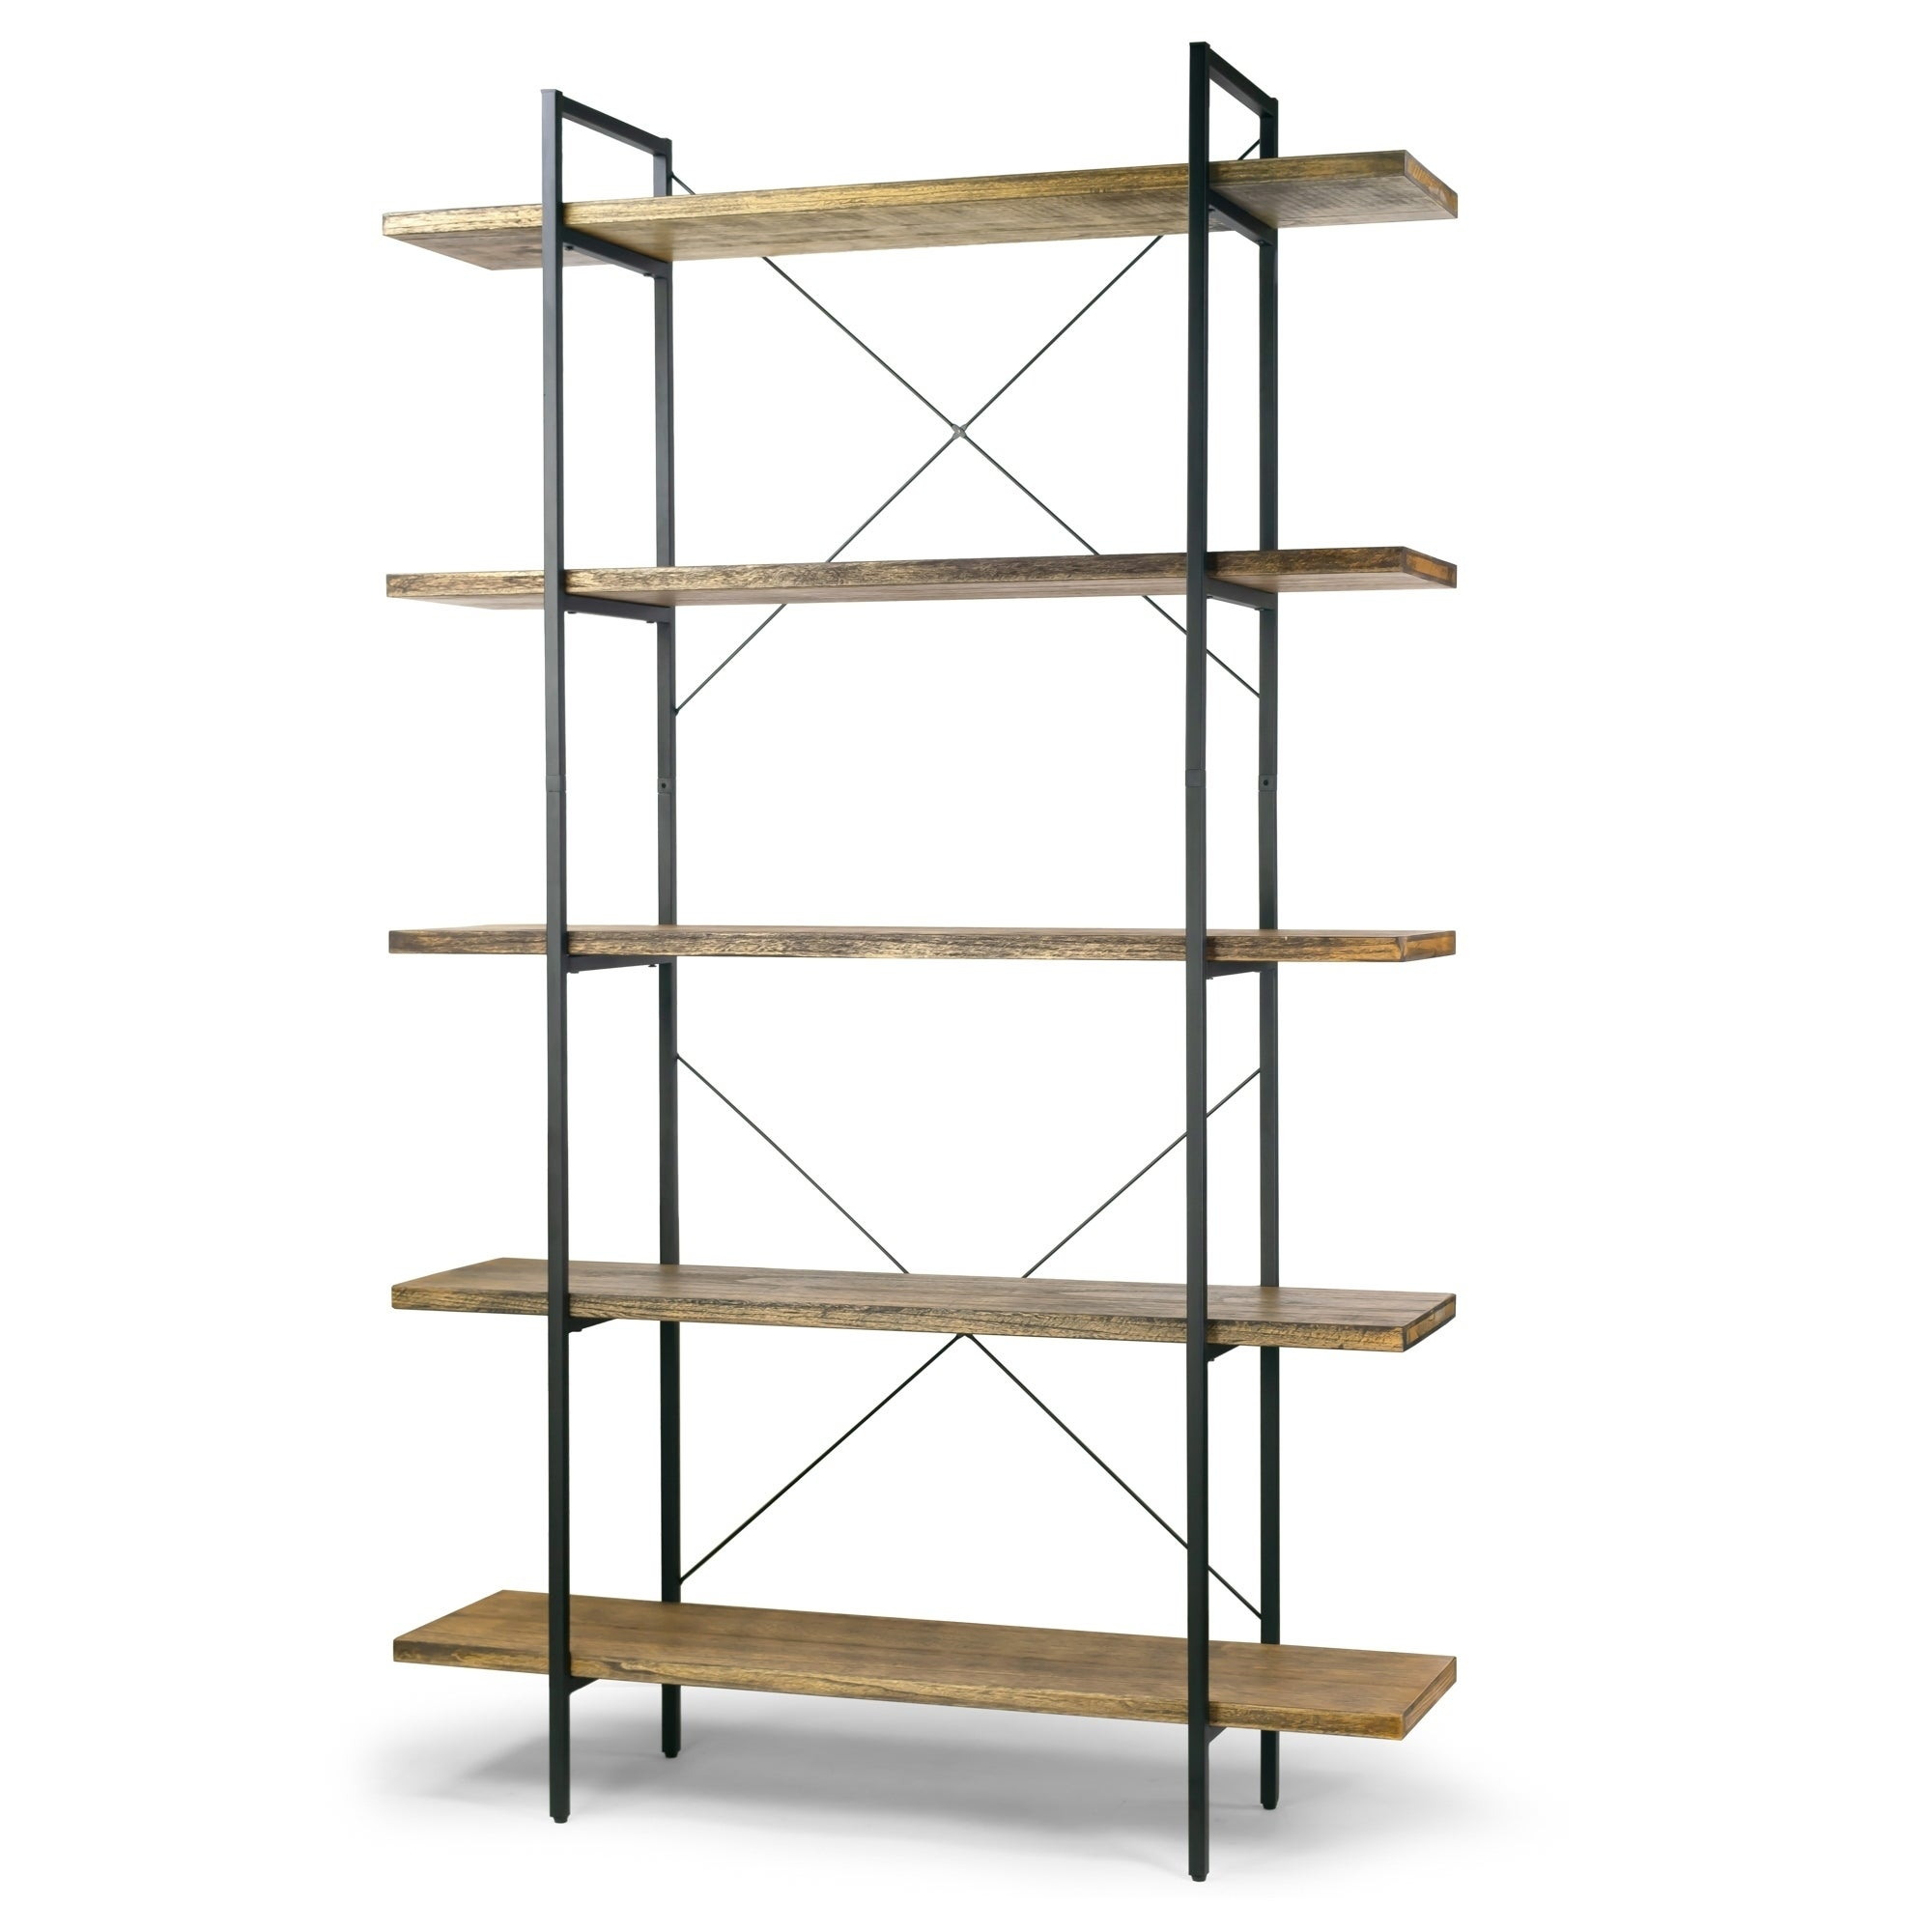 Amrit 84 5 Wood Shelf Metal Frame Etagere Five Shelf Bookcase Overstock 27321053